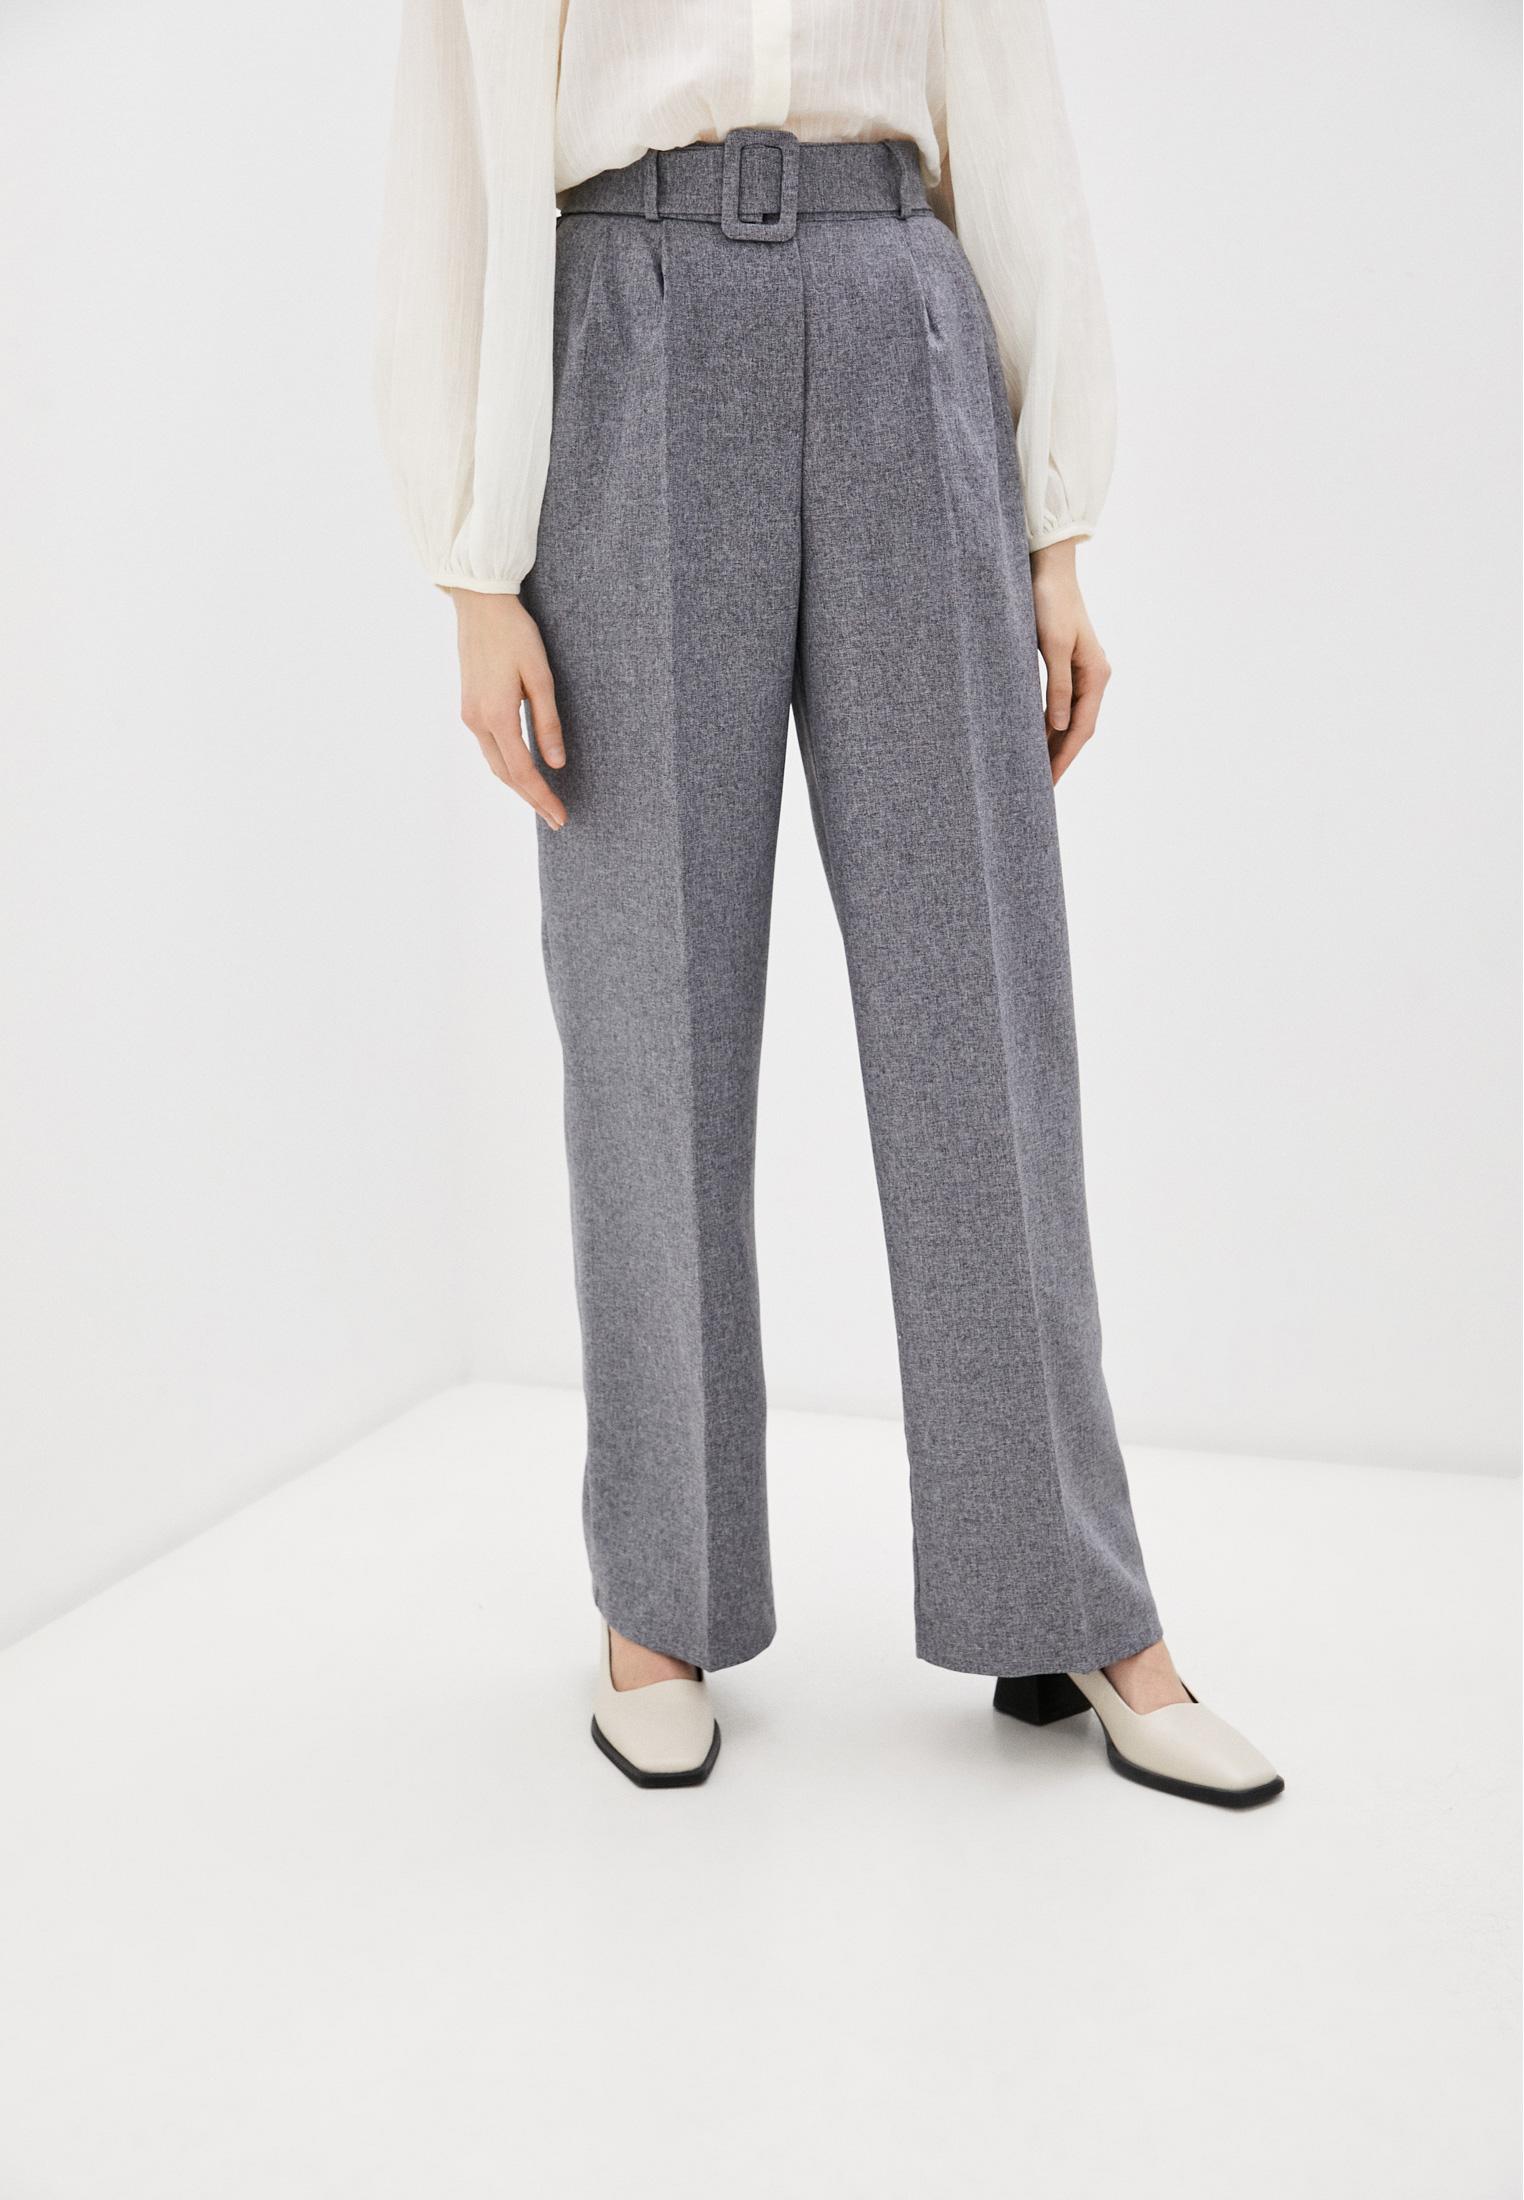 Женские классические брюки Bad Queen BQ210097